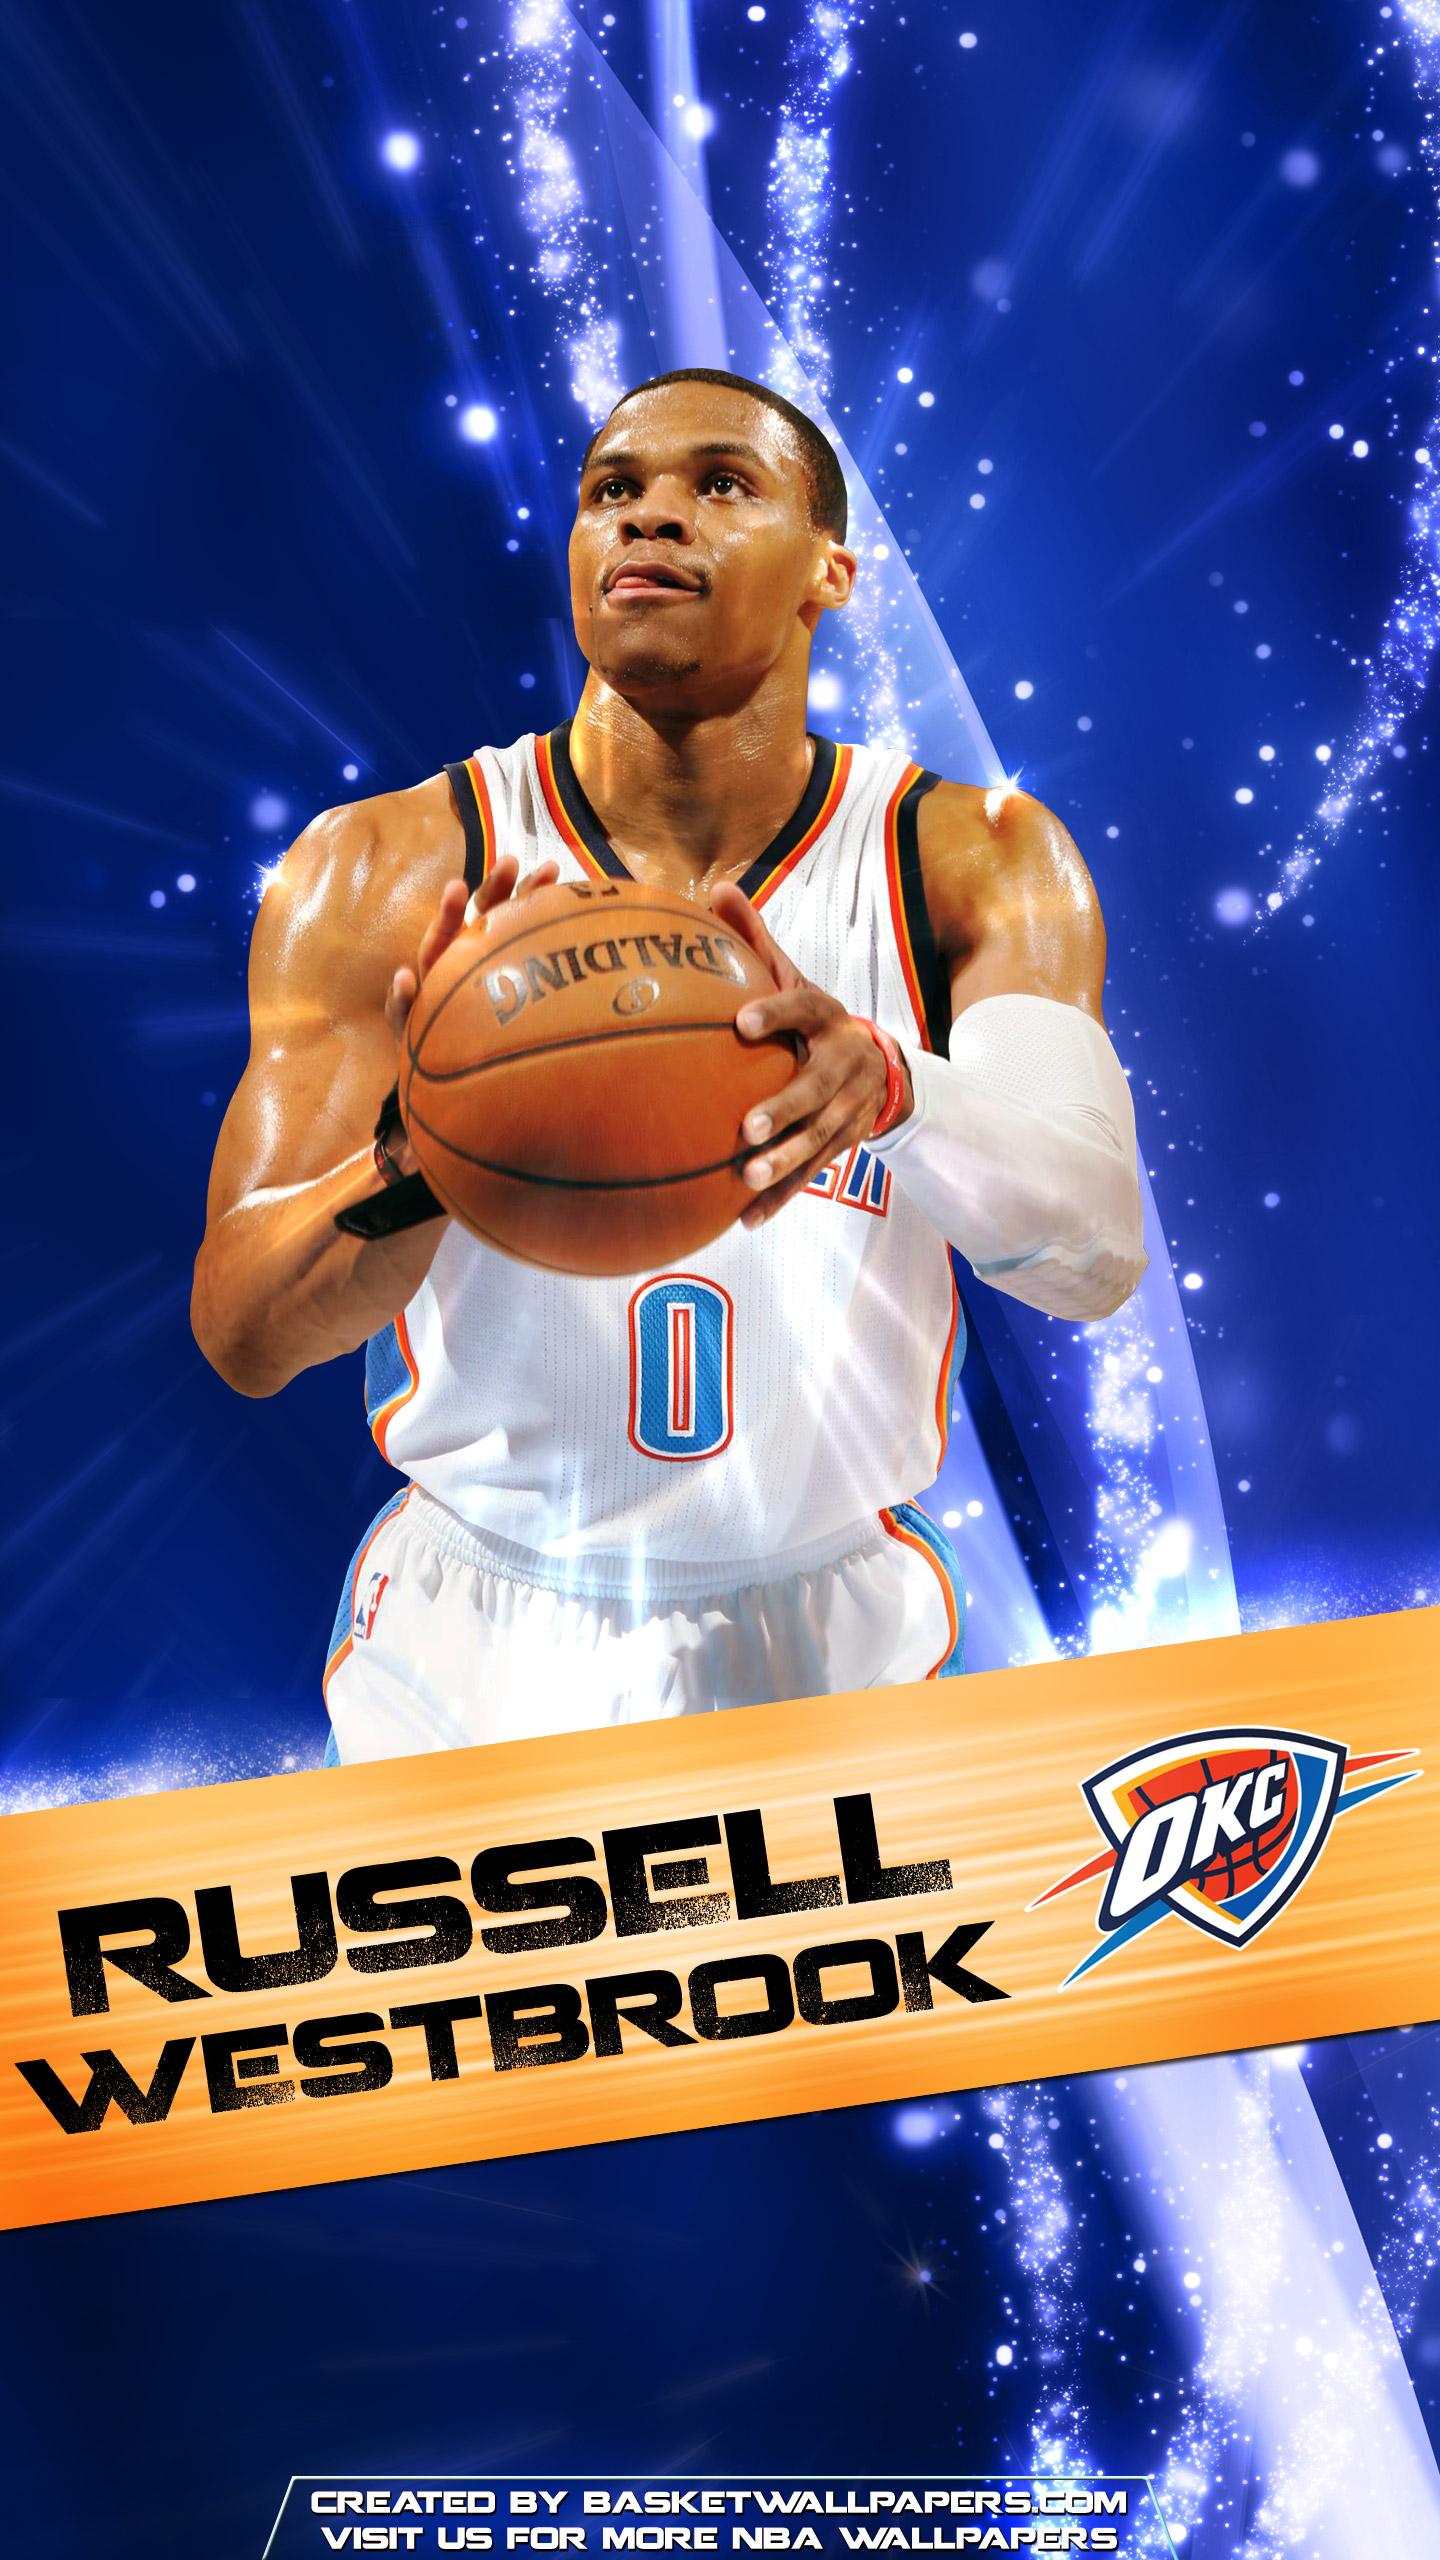 Russell Westbrook OKC Thunder 2016 Mobile Wallpaper Basketball 1440x2560